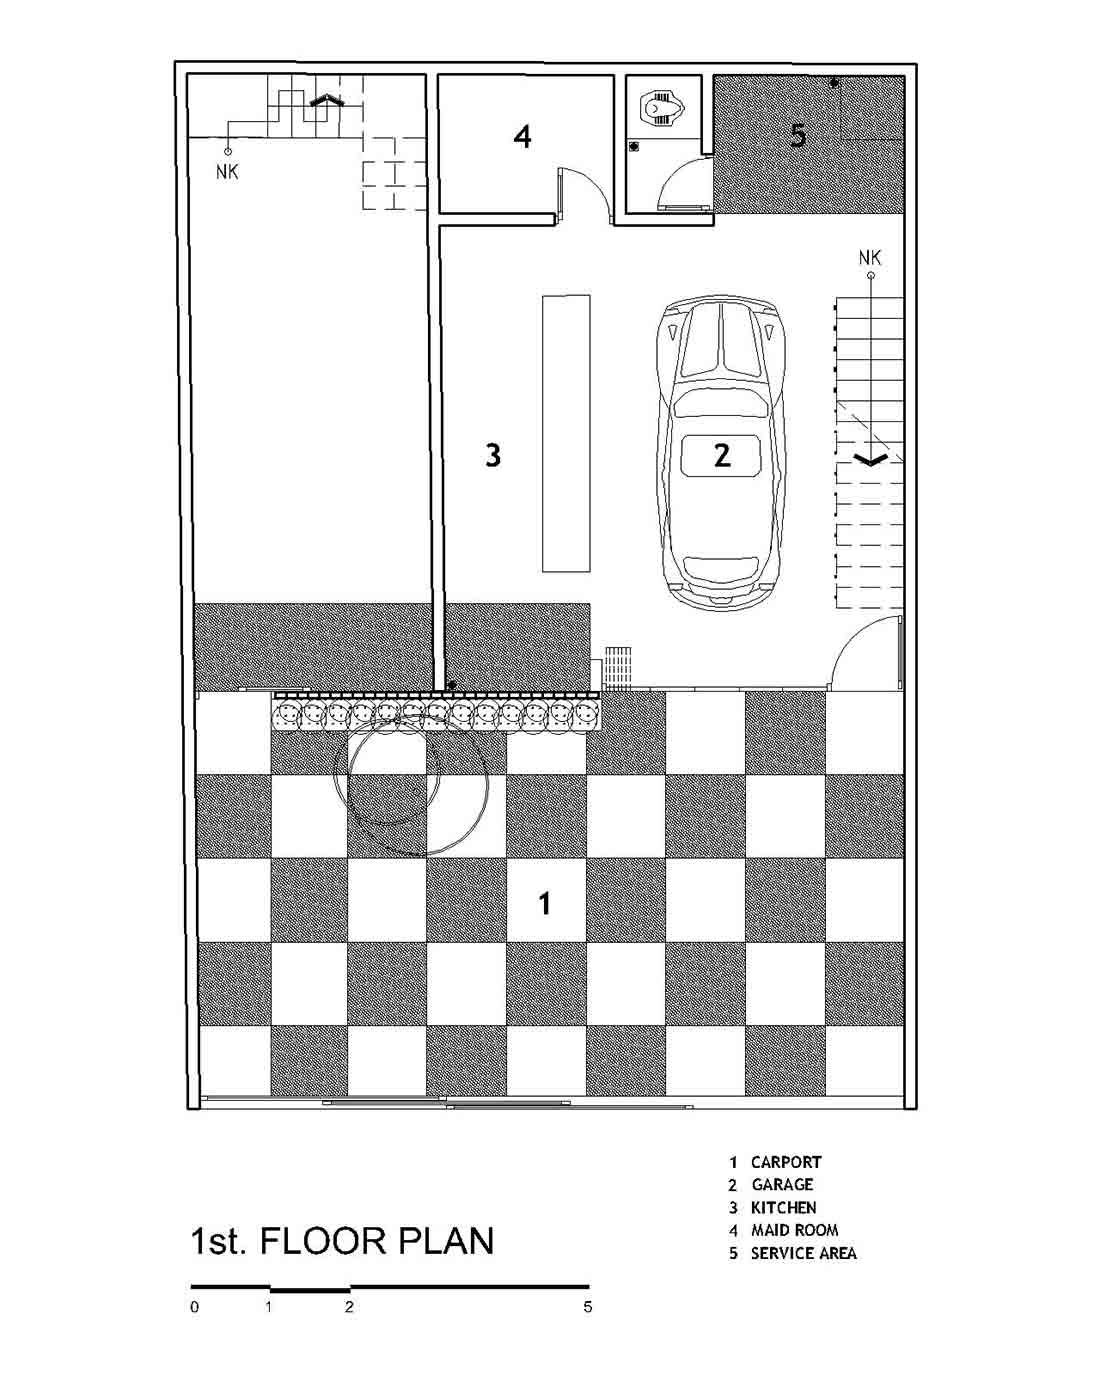 Denah lantai 1 Fitted House karya Bahtera Associates // arsitag.com